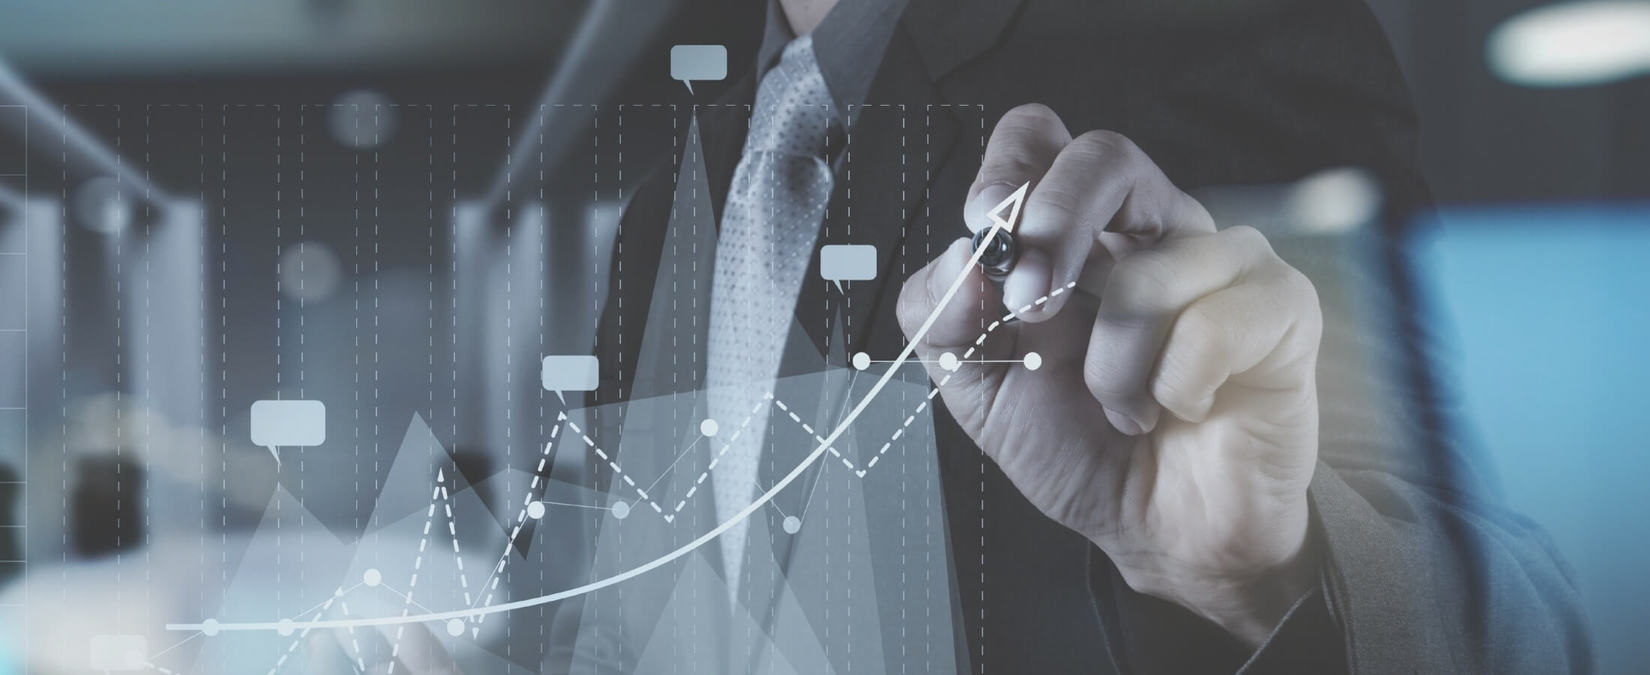 Seo Consultants for B2B SEO companies